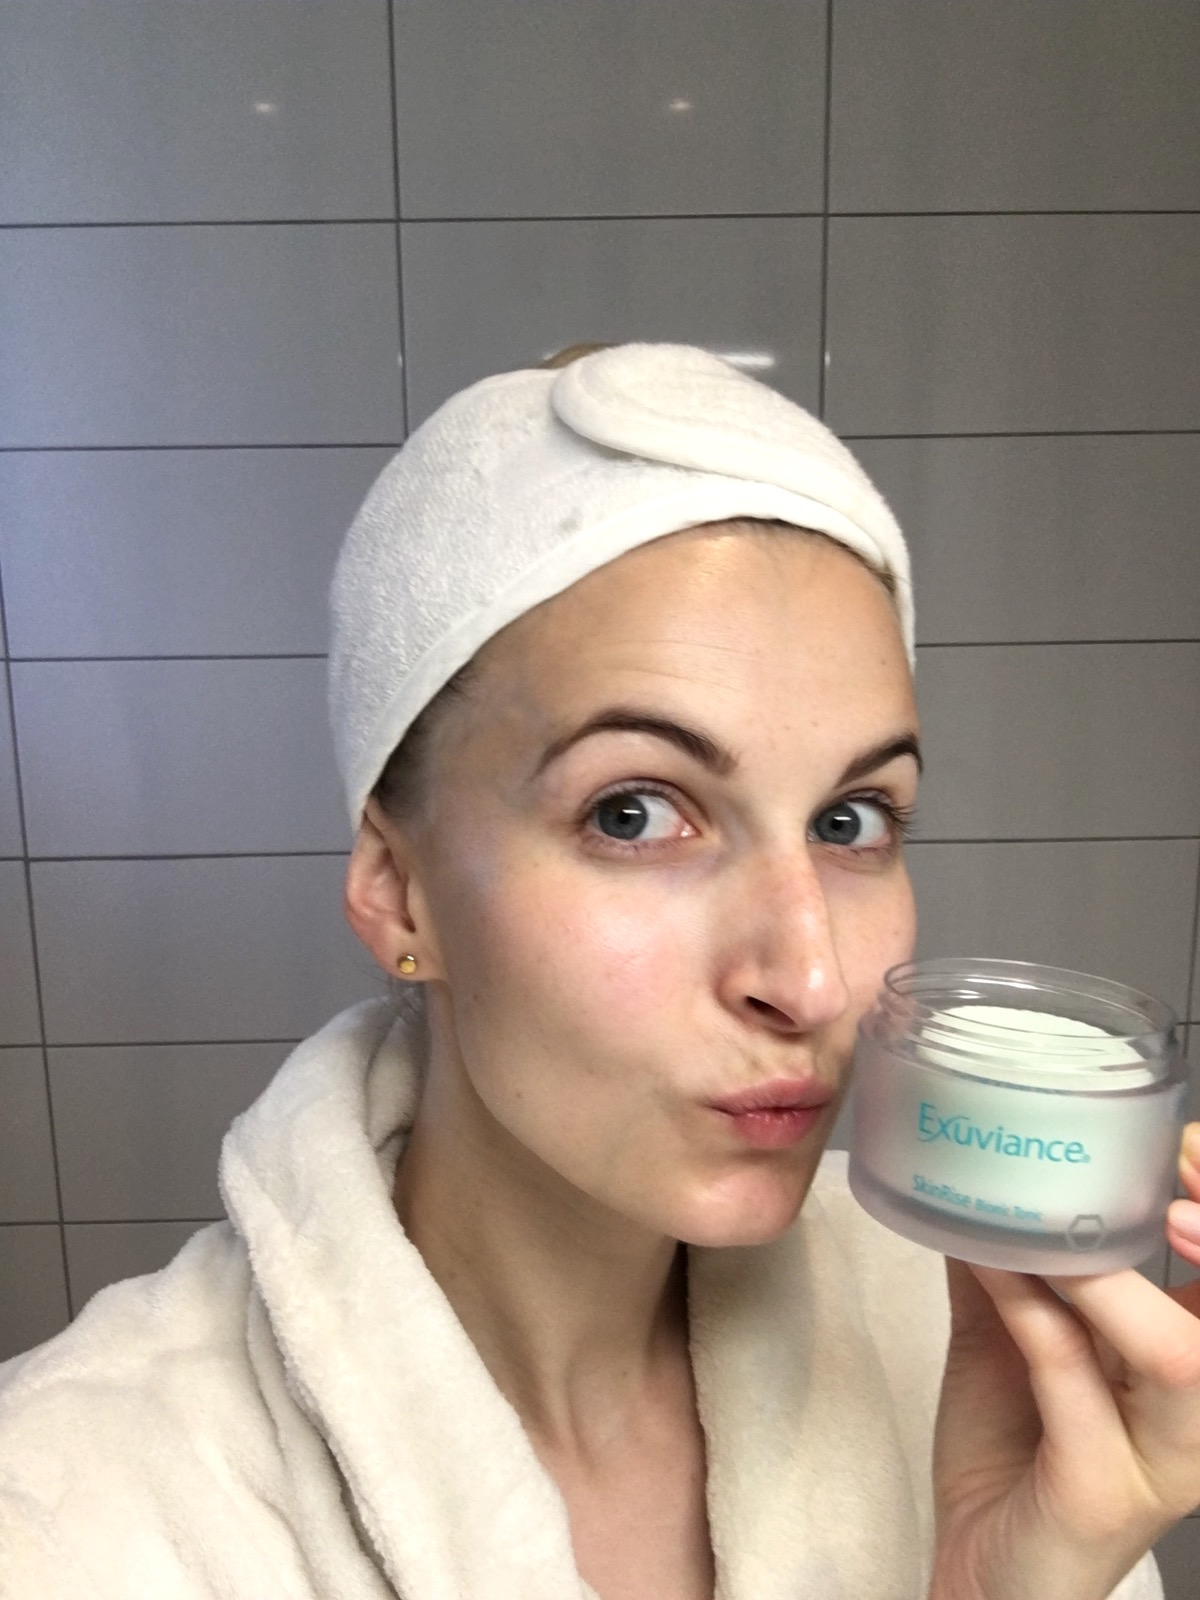 Exuviance Skin Rise Bionic Tonic Pads skönhetssnack.se IMG_6984